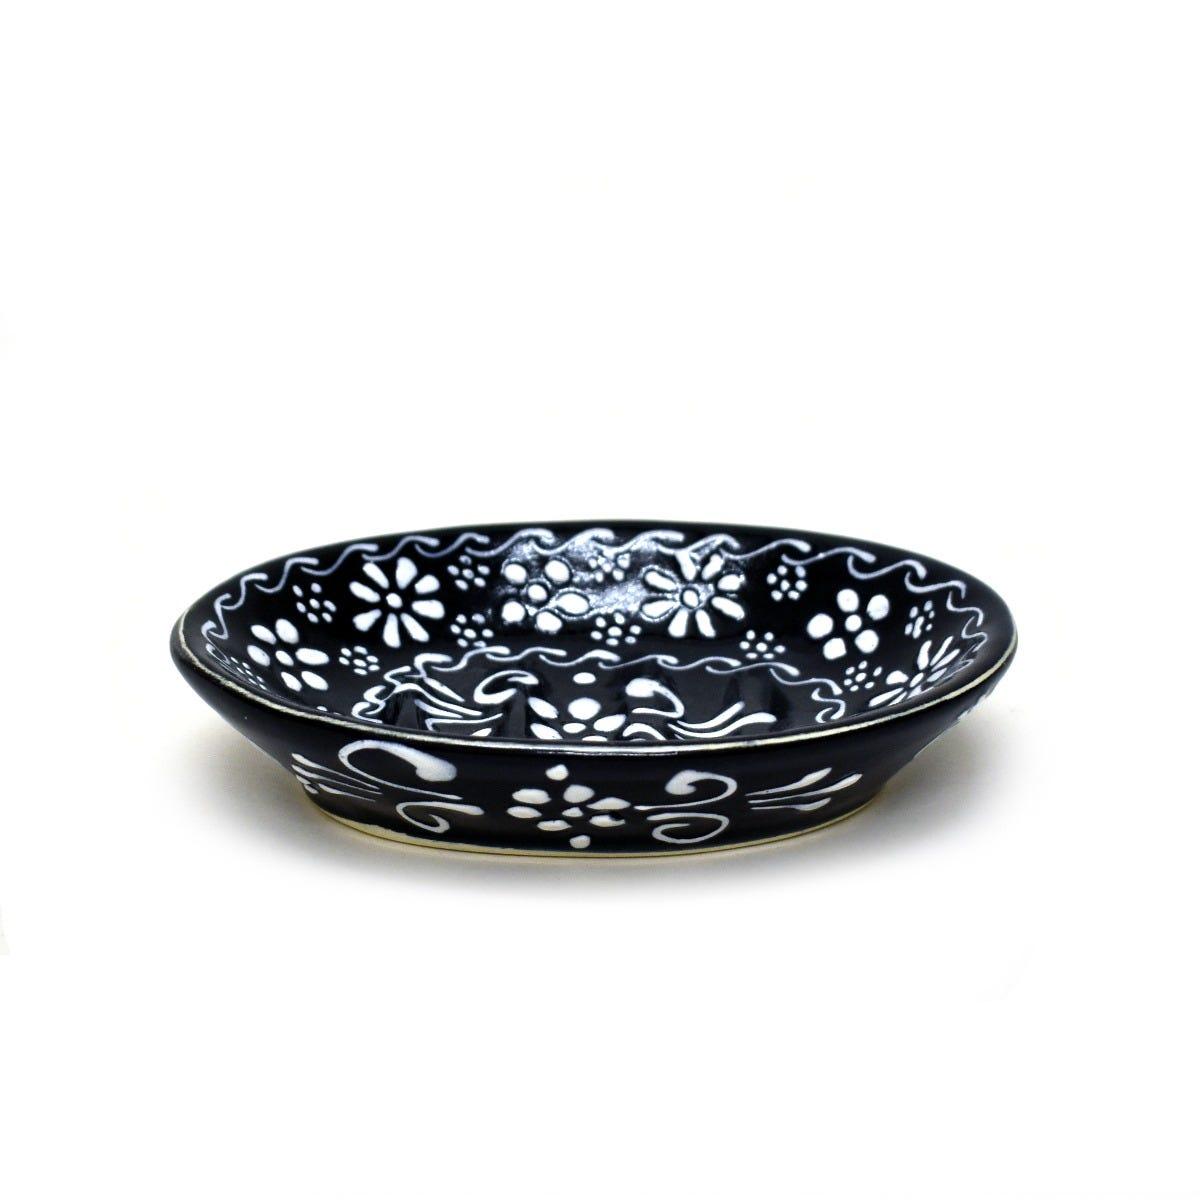 Jabonera con relieve en negro